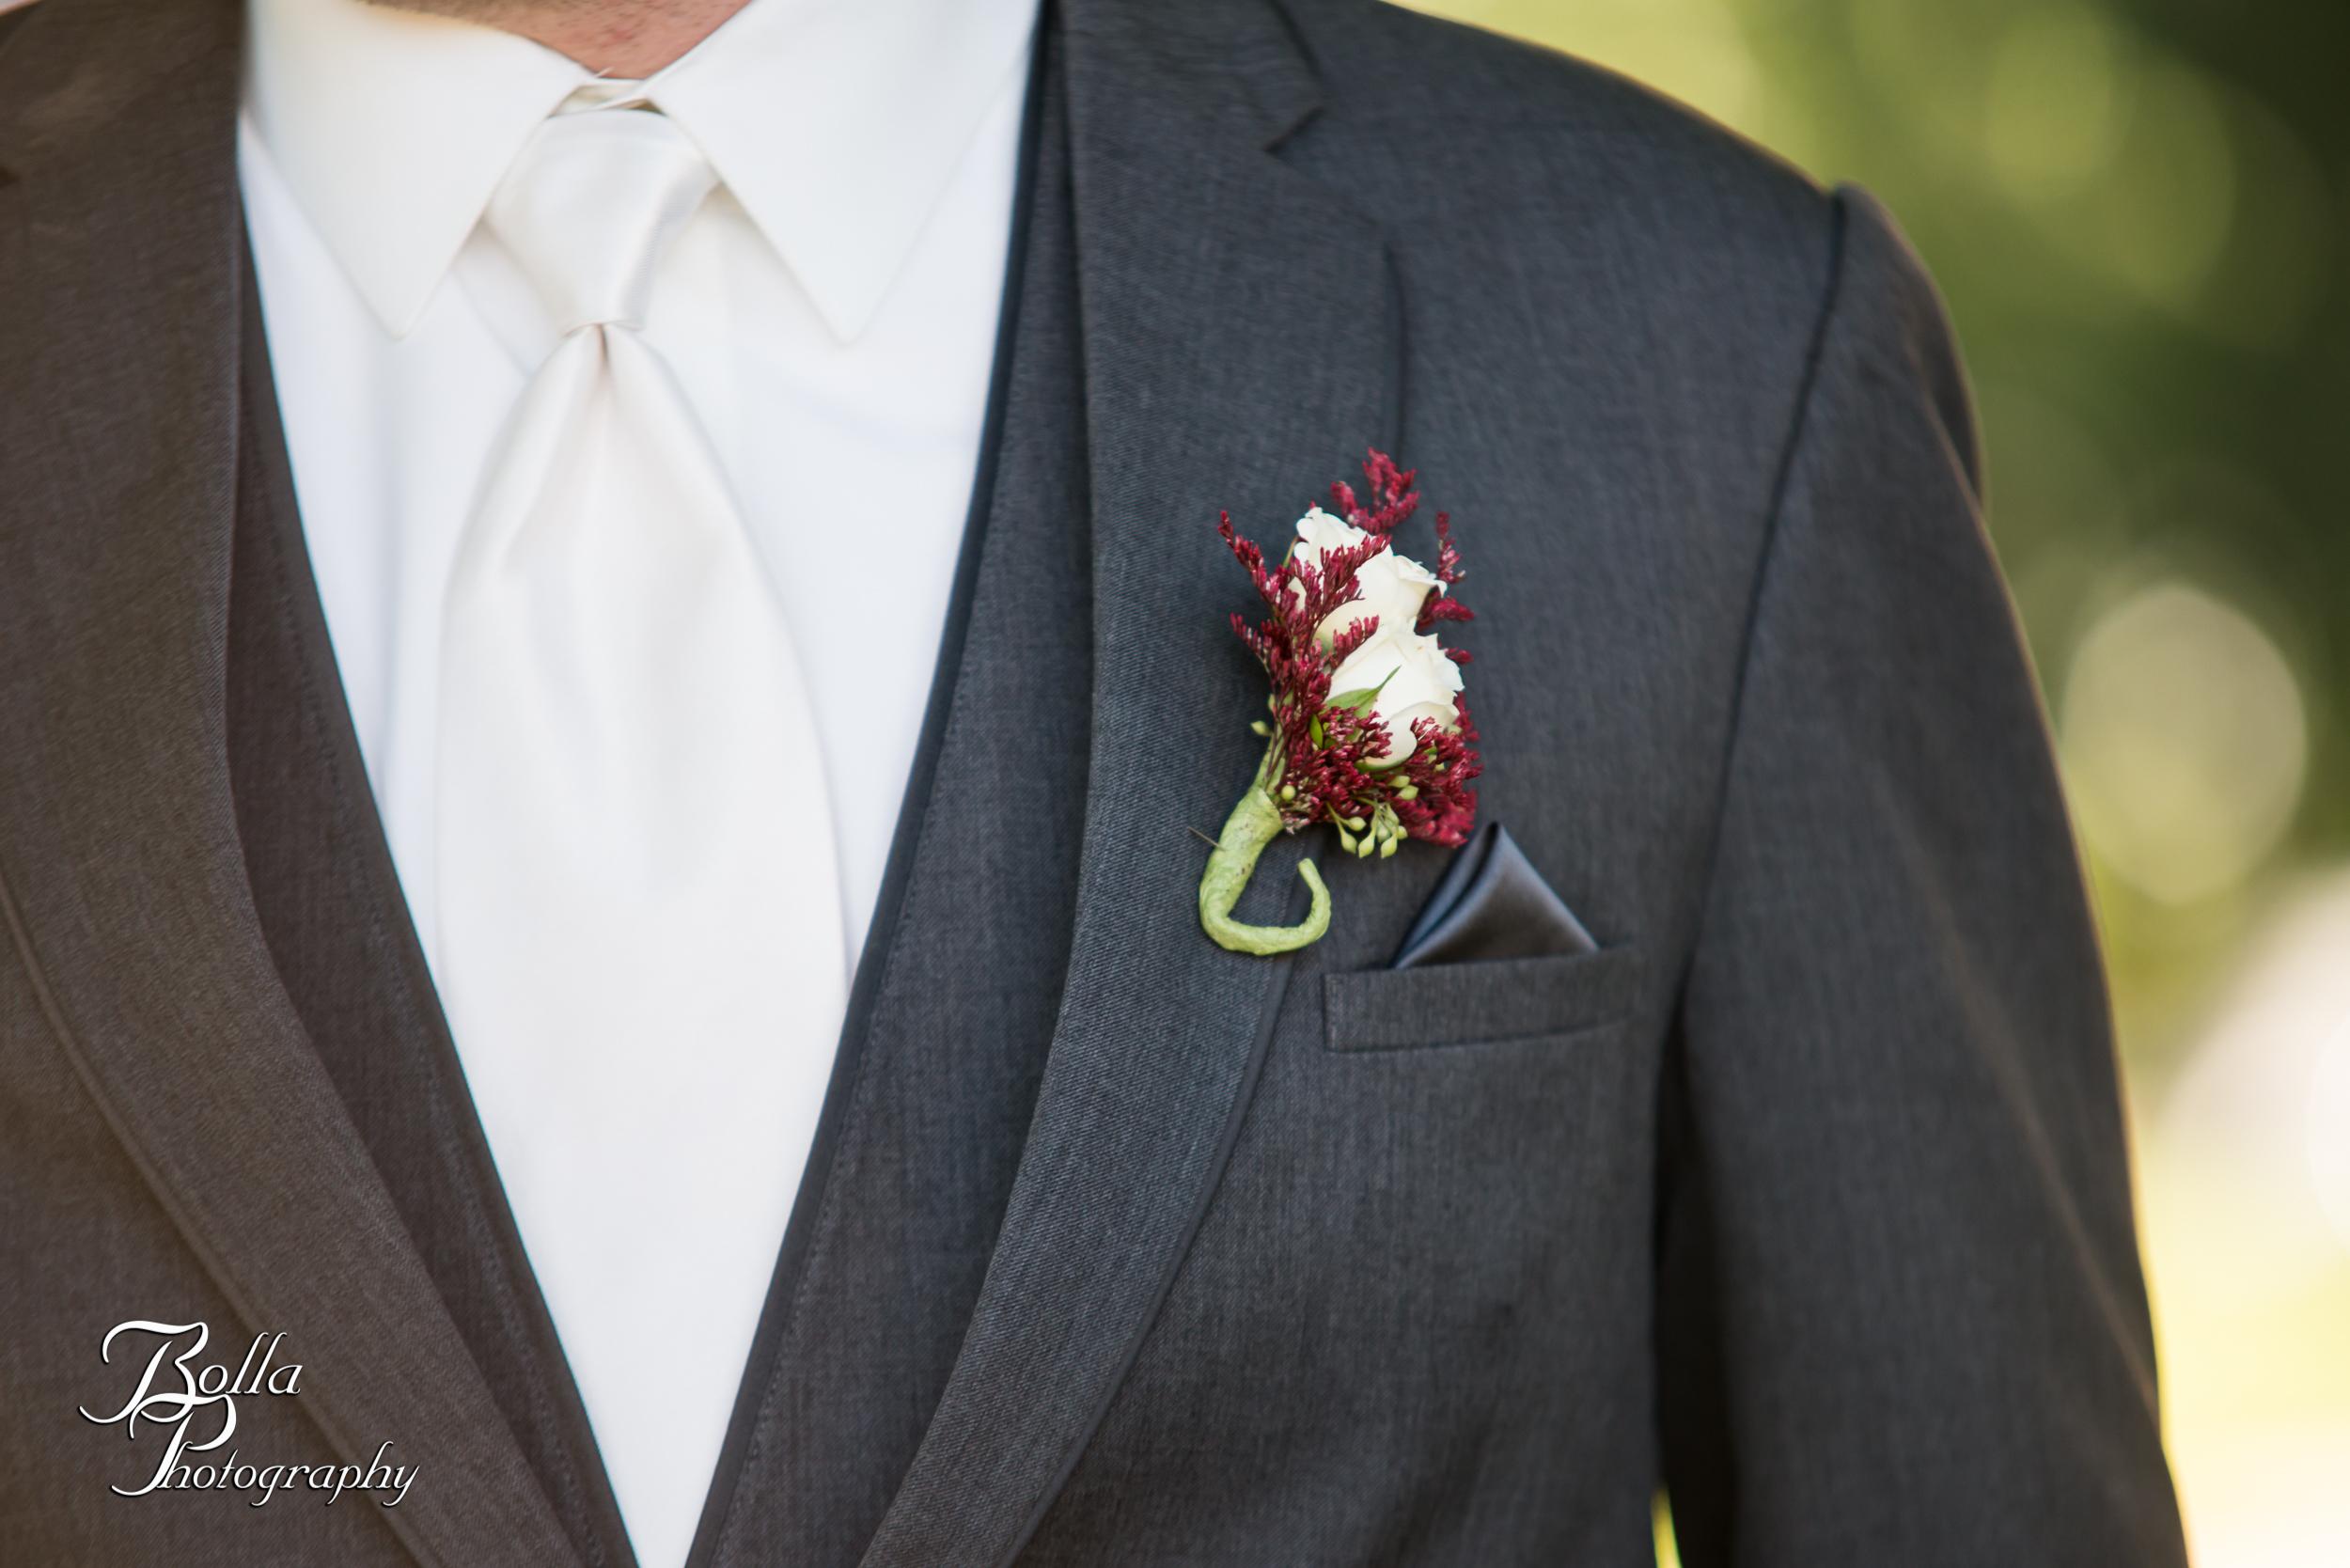 Bolla_photography_edwardsville_wedding_photographer_st_louis_weddings_Reilmann-0325.jpg